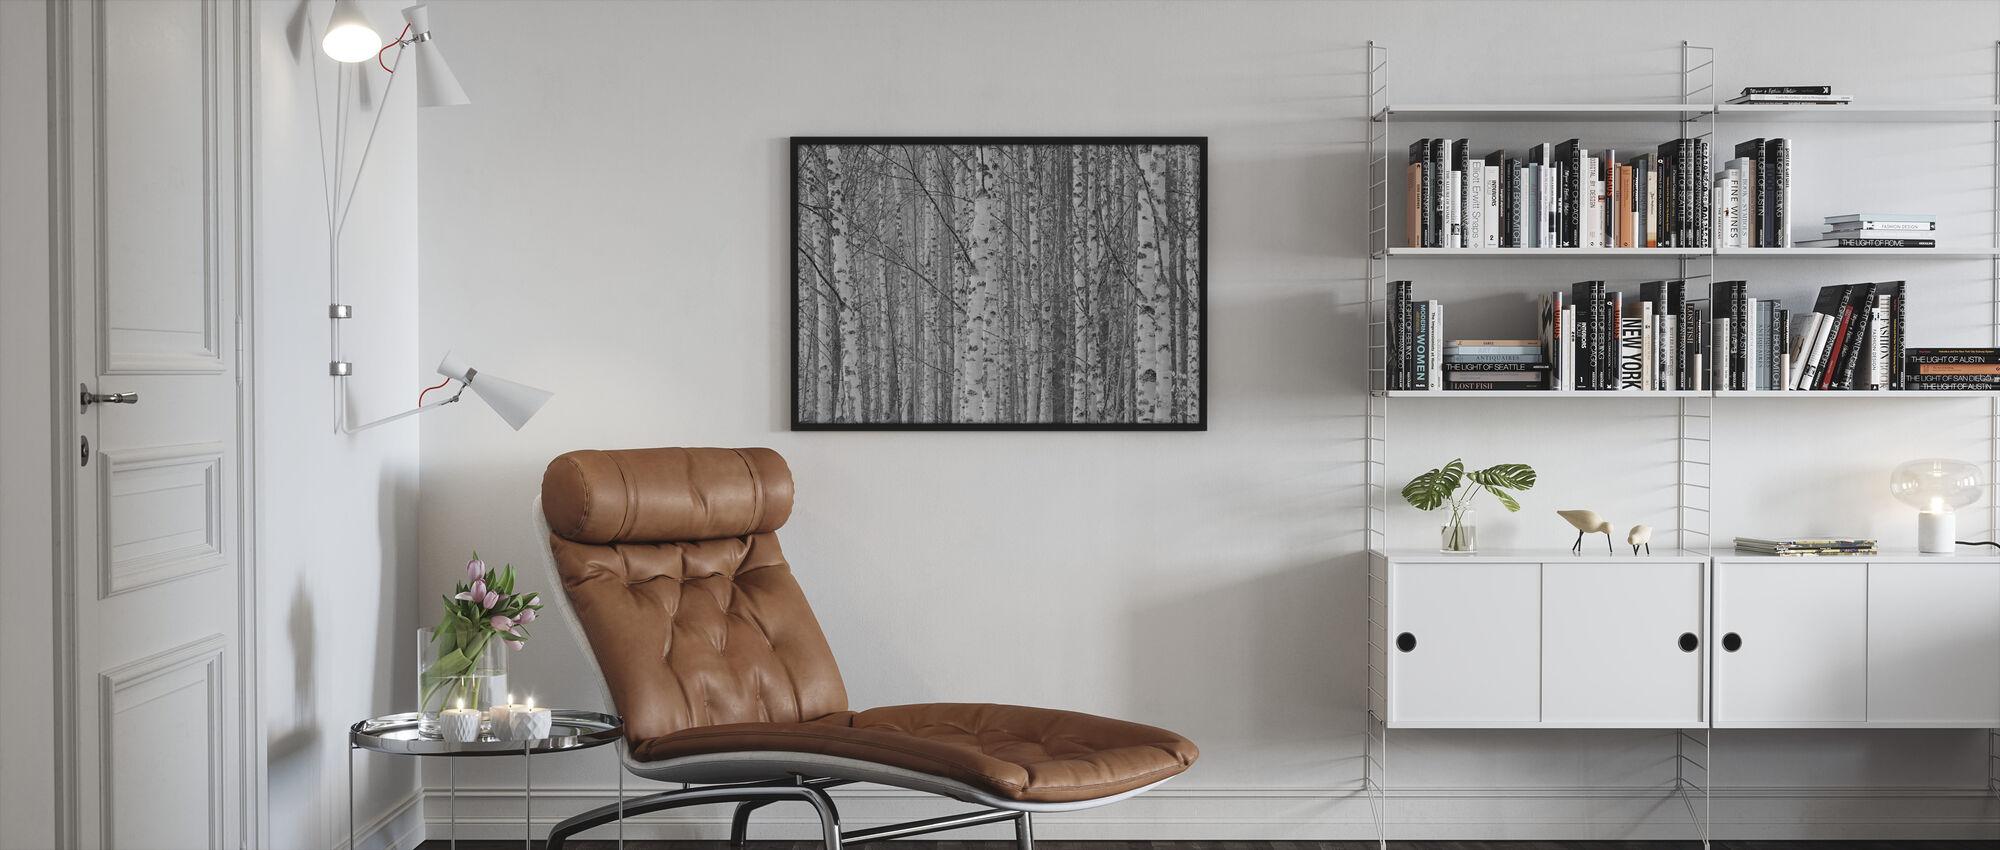 Gotland Birch Forest - Framed print - Living Room